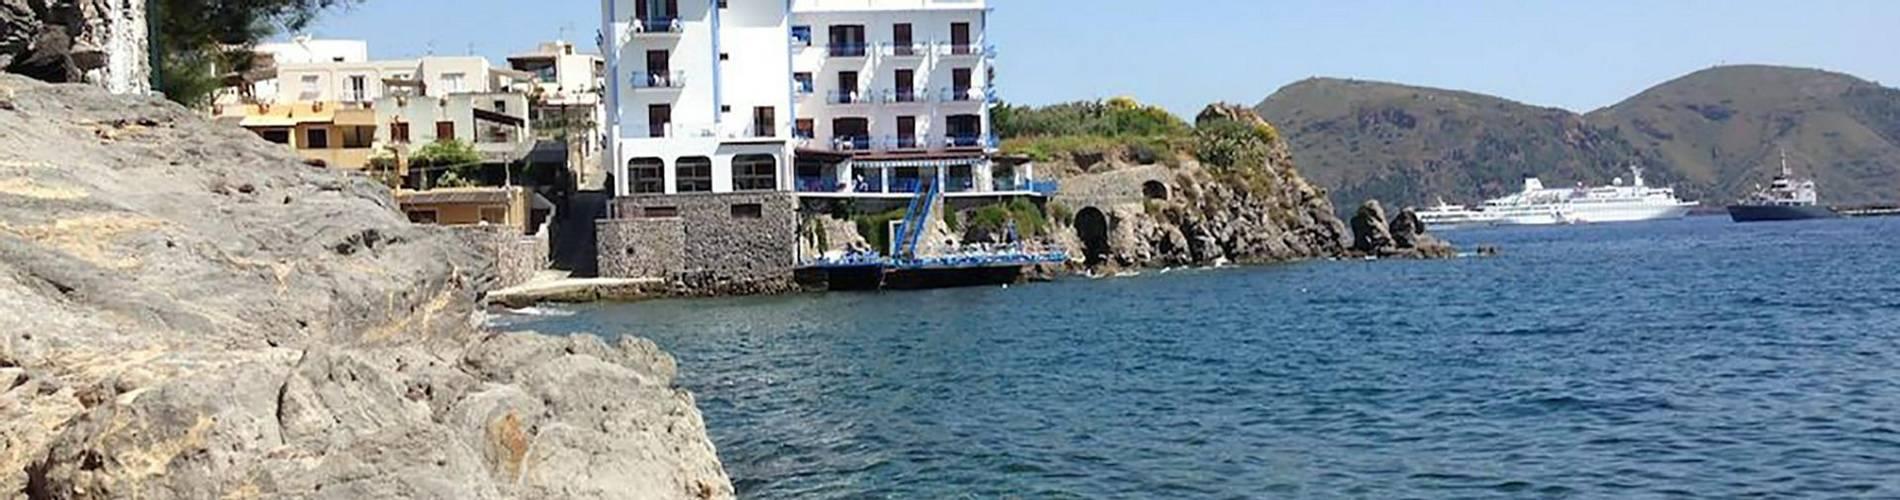 Rocce Azzurre, Sicily, Italy (2).jpg